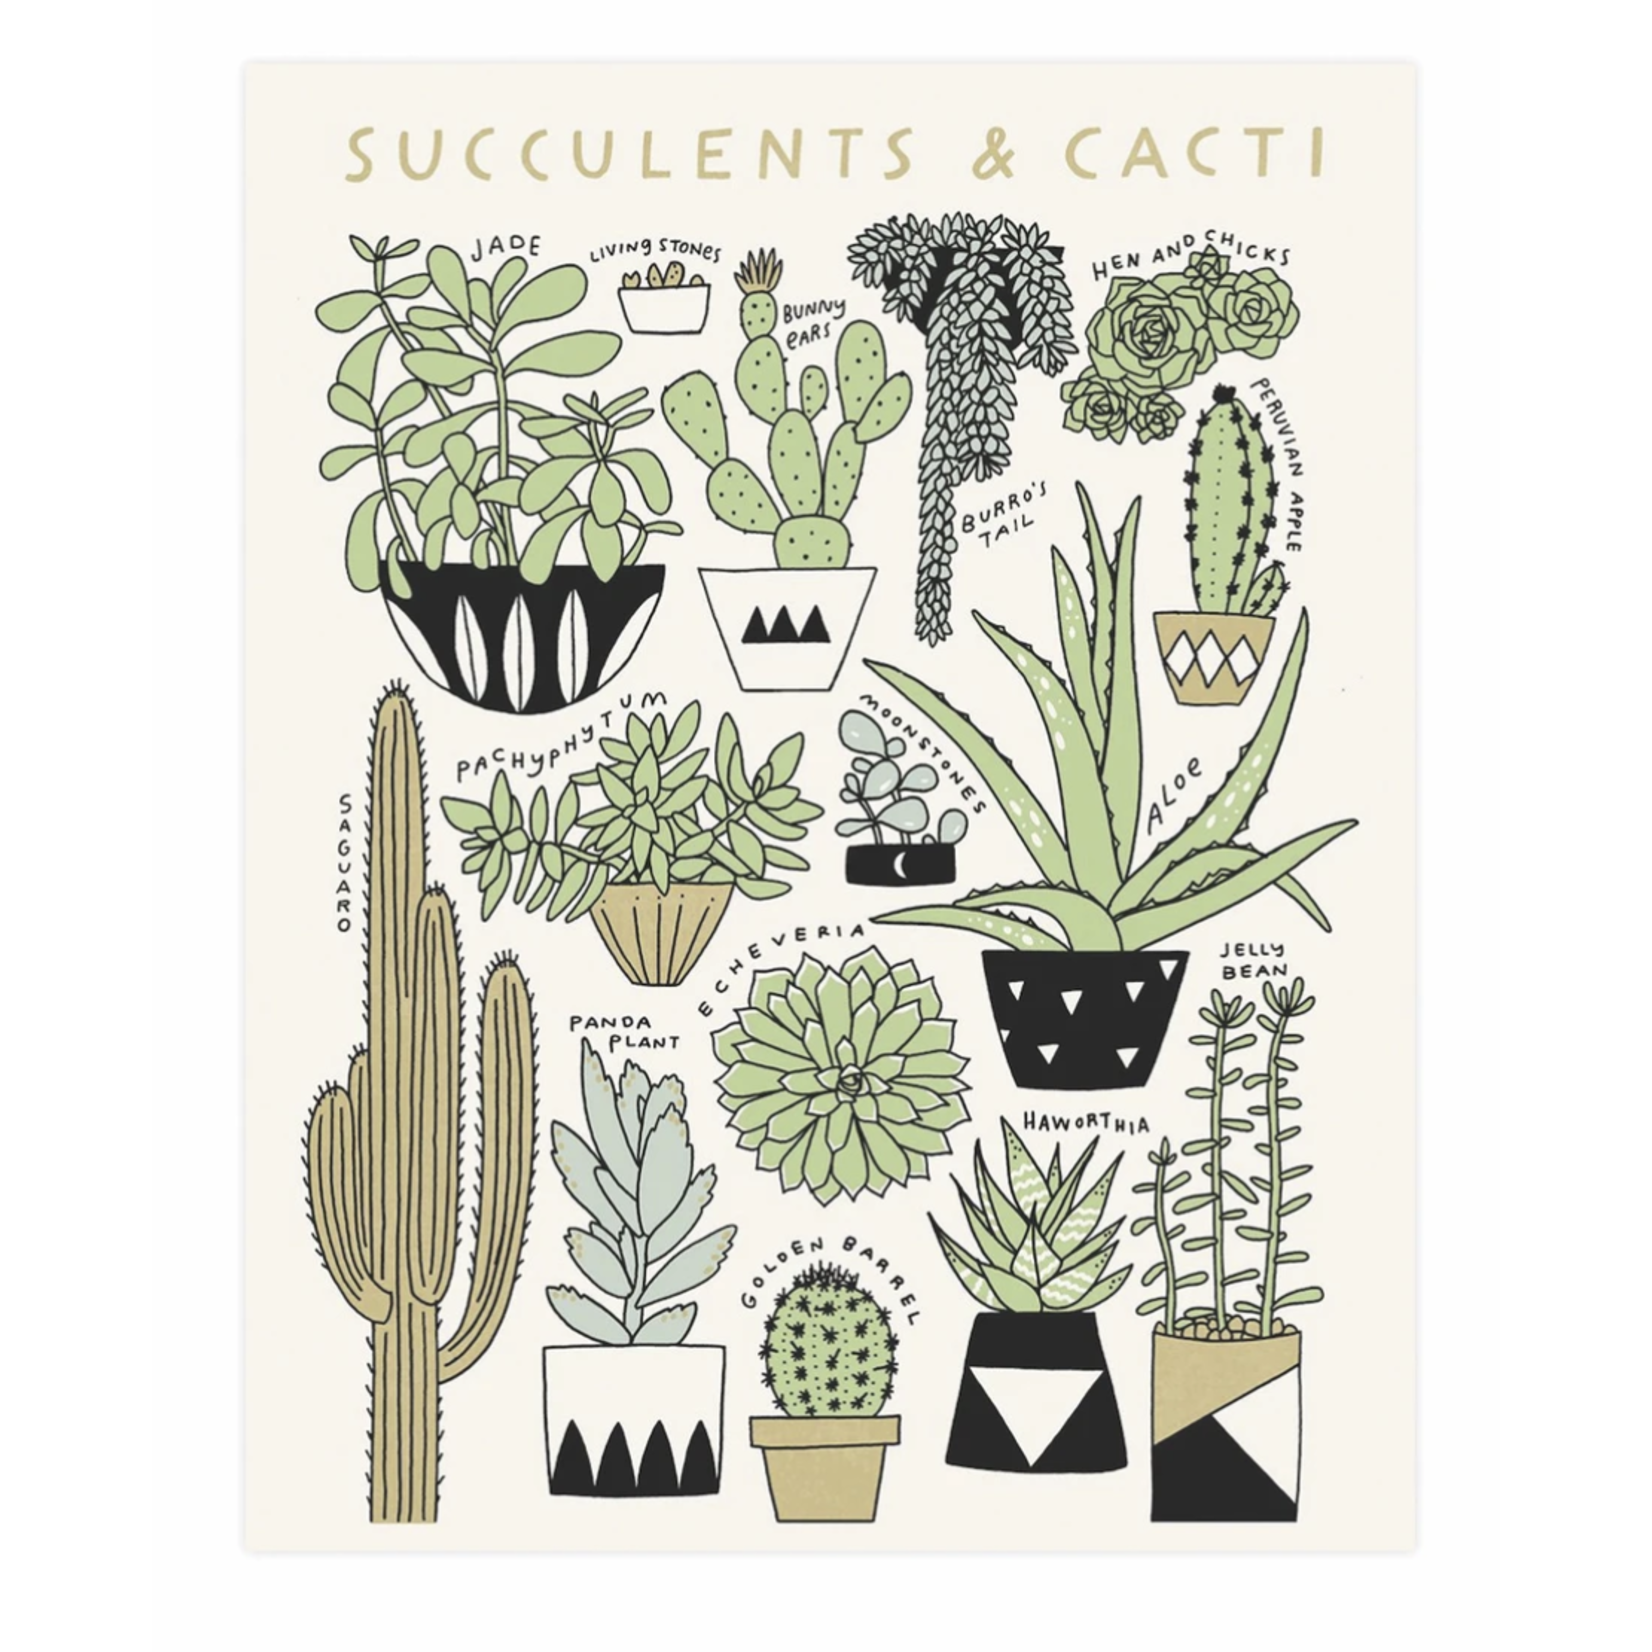 Worthwhile Paper Succulents & Cacti Botanical 11x14 Art Print